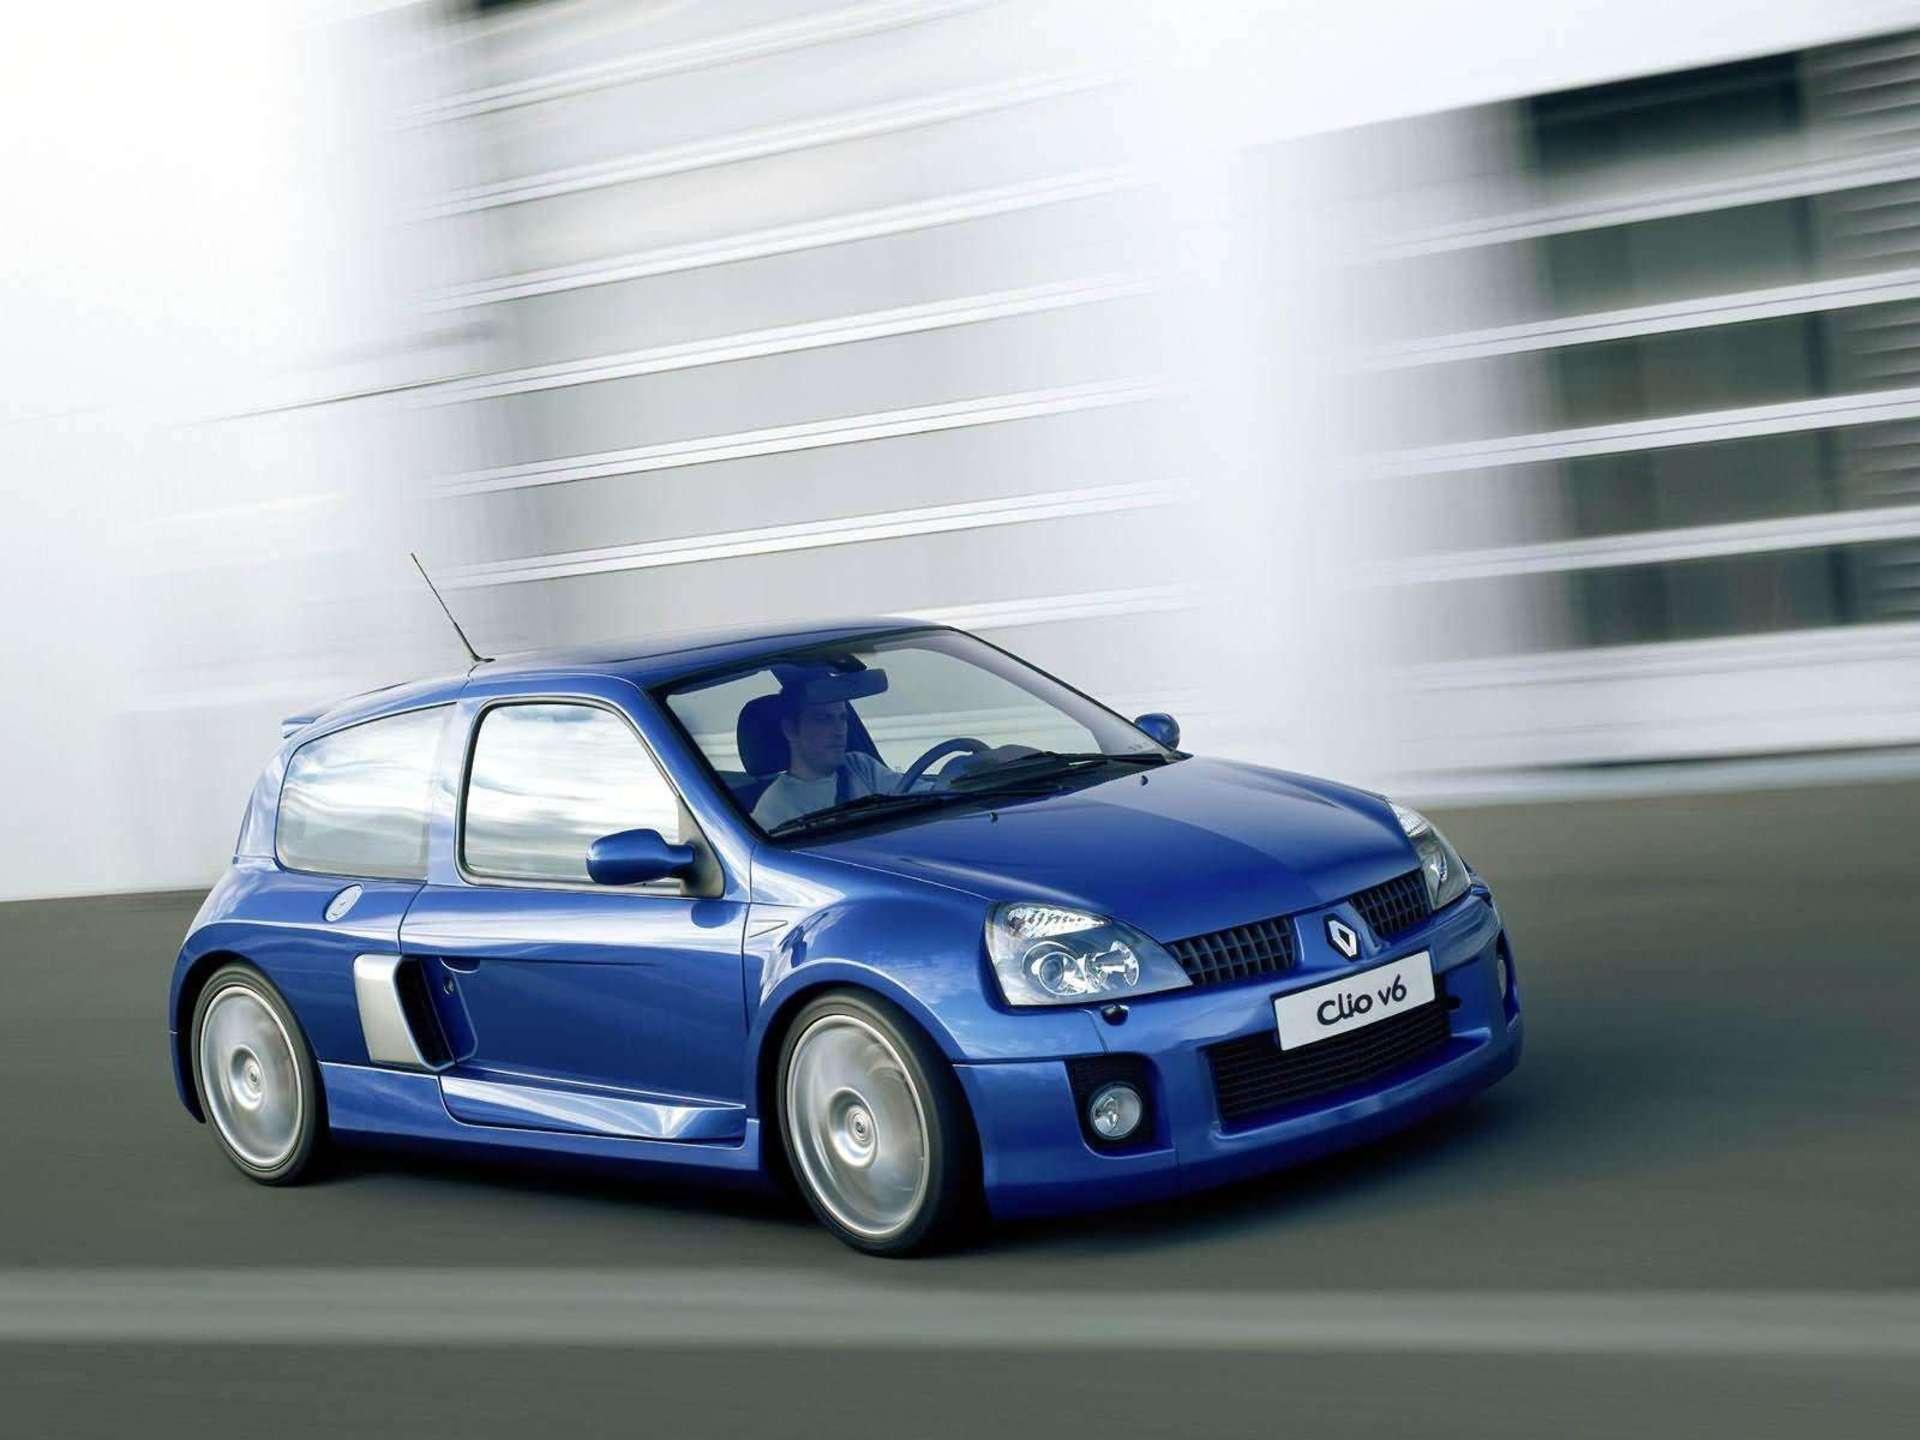 Renault Clio V6 Renault Sport 2003 1600 09